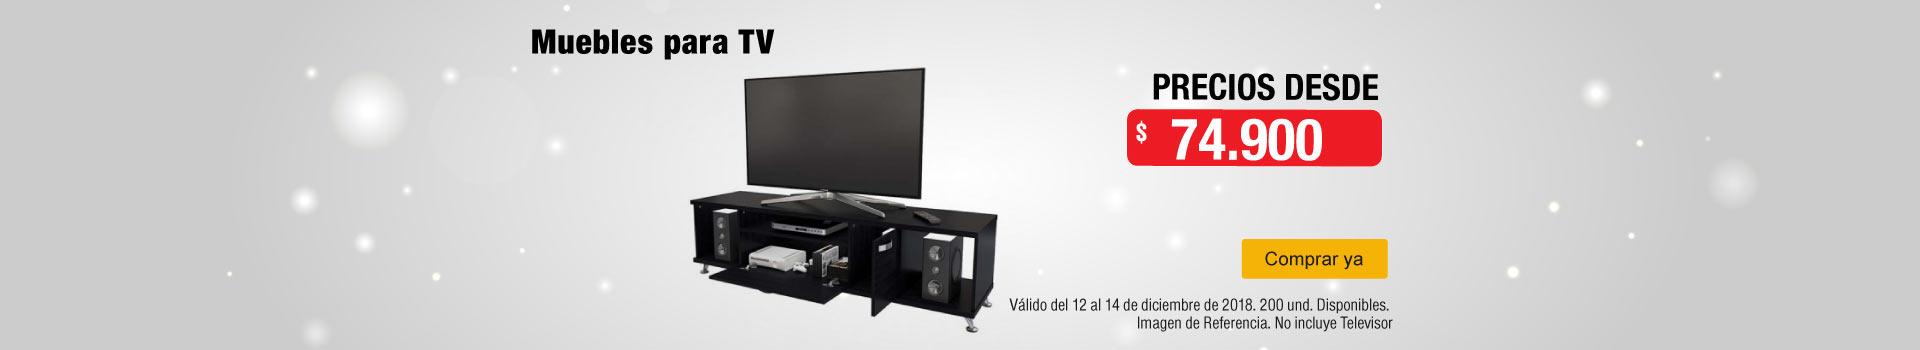 AK-BCAT-3-hogar---muebles-mesas-tv-Dic12